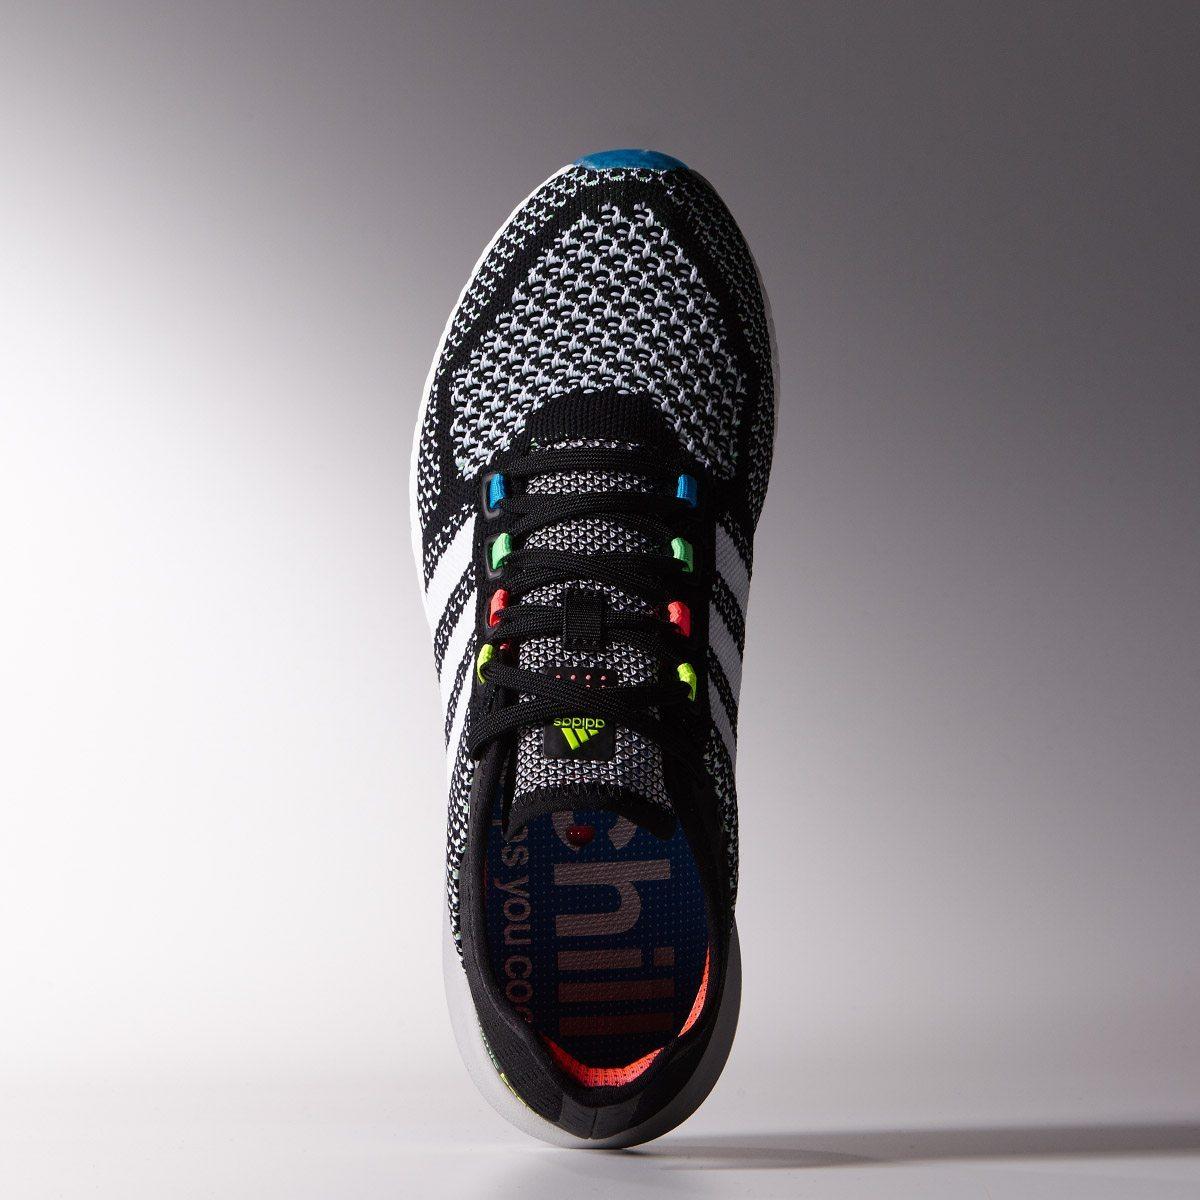 adidas Climachill Cosmic Gazelle Boost 6